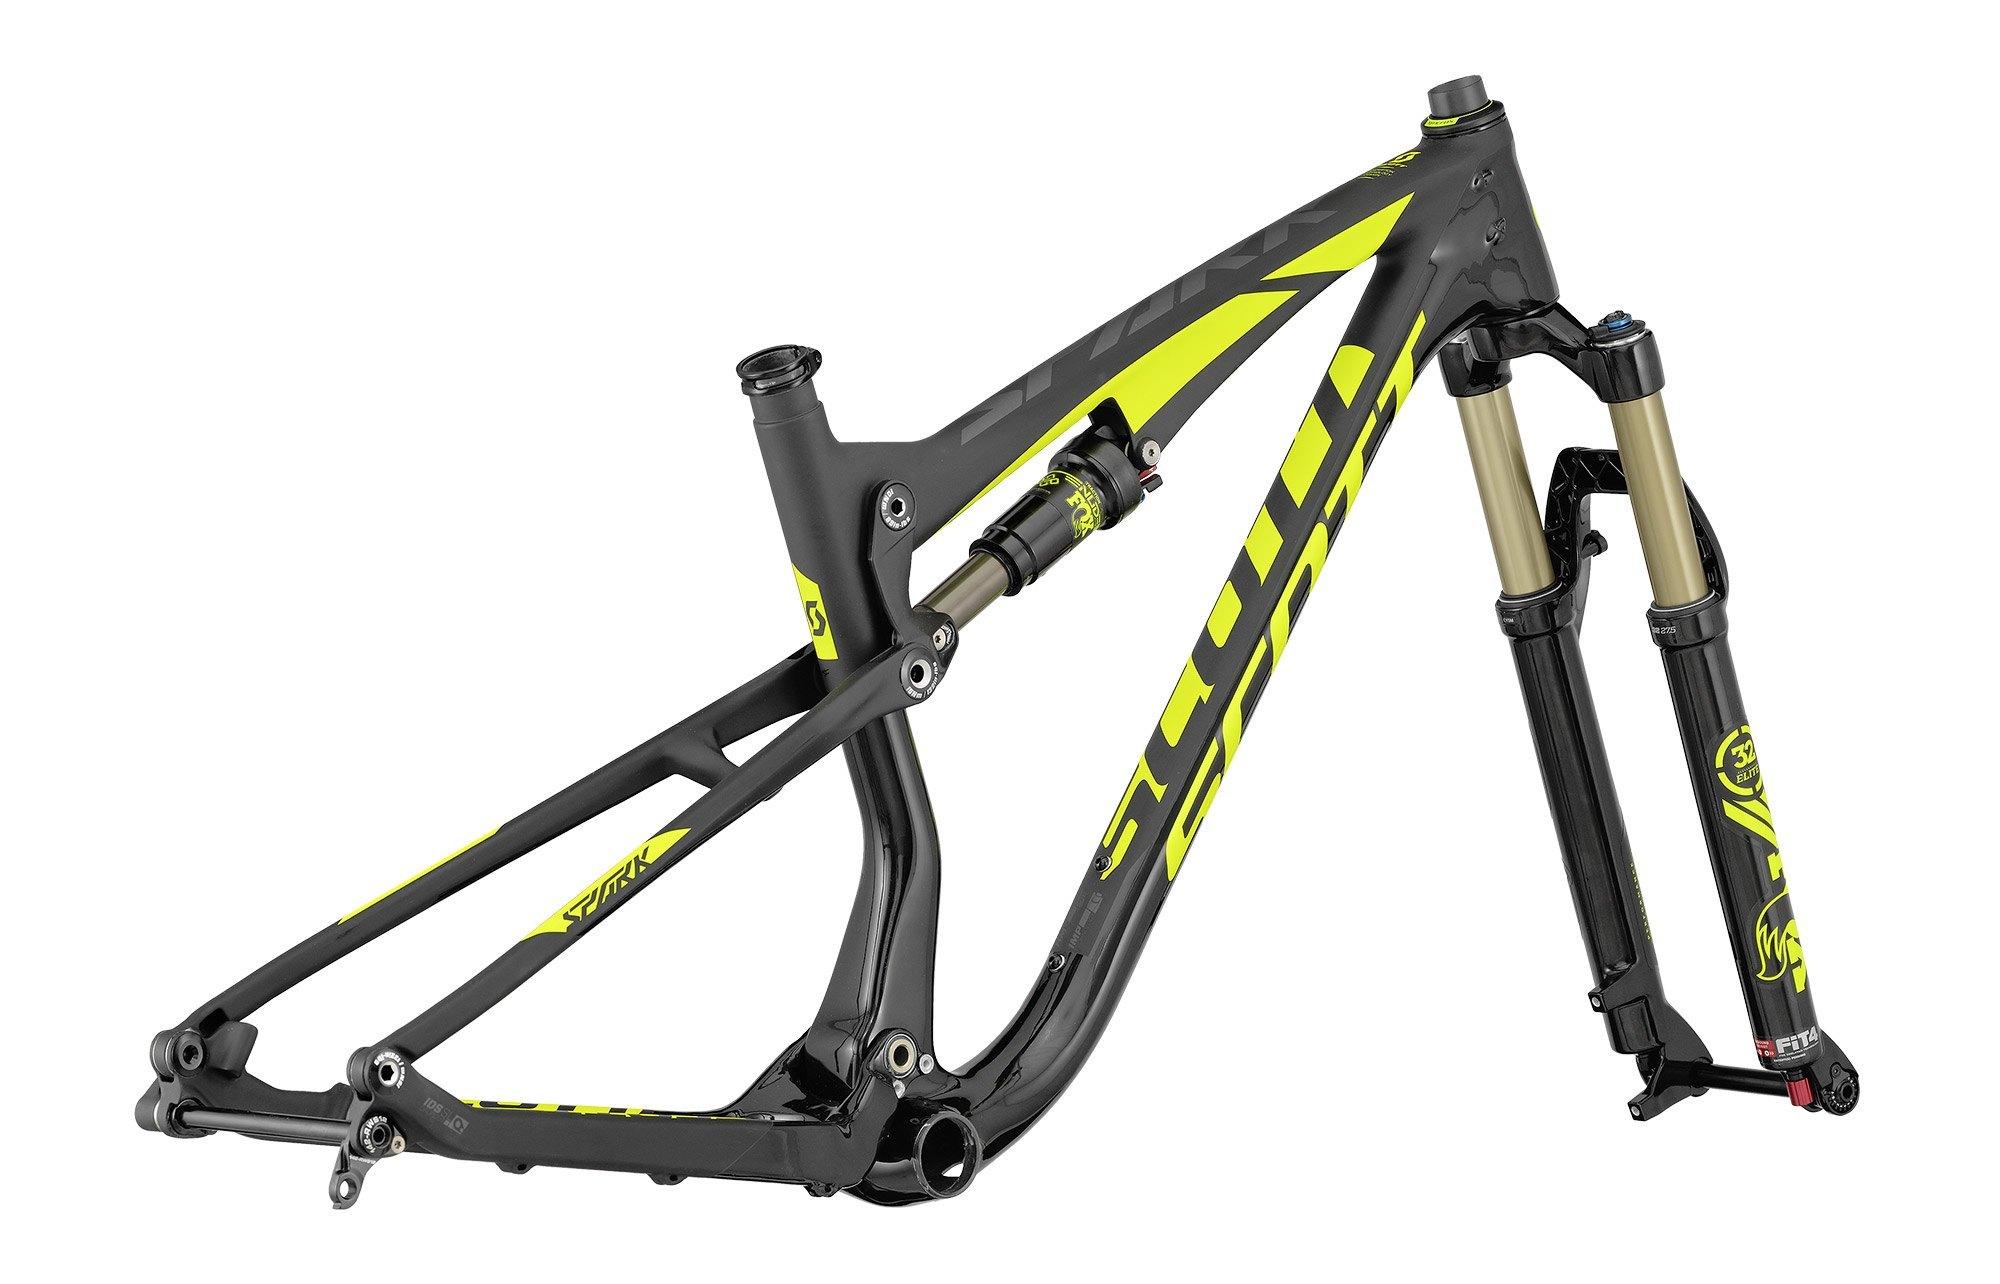 0e4c42a7a13 2016 Scott Spark 700 RC Frameset | R&A Cycles